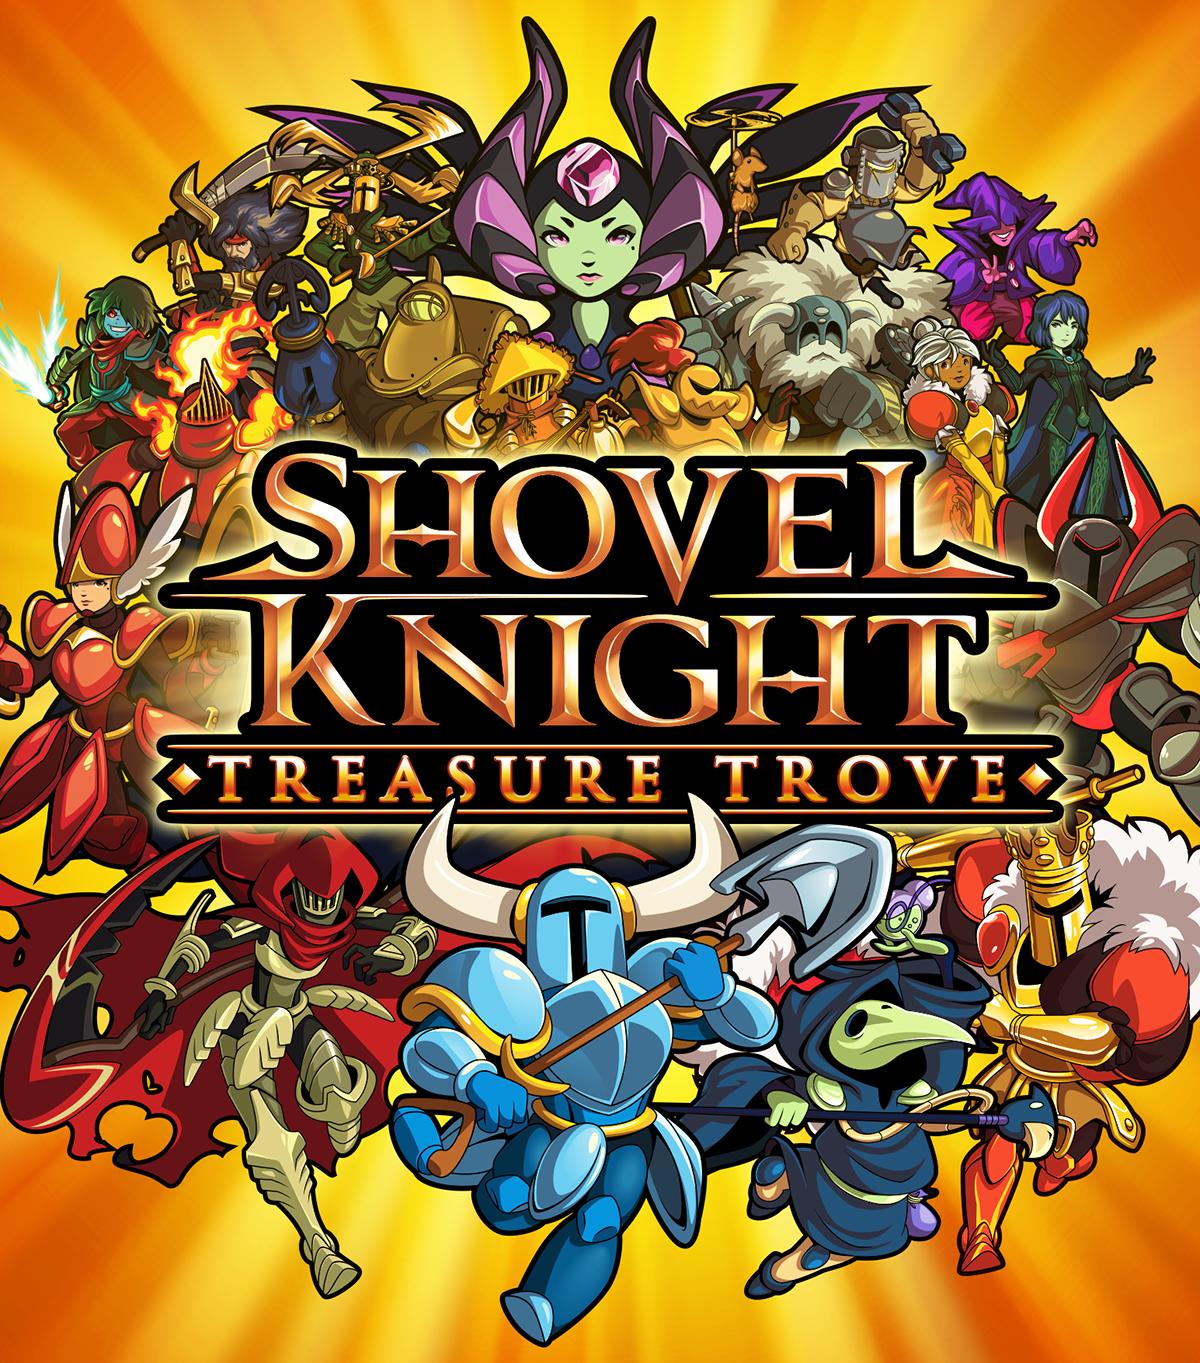 Shovel Knight: Treasure Trove | Shovel Knight Wiki | FANDOM